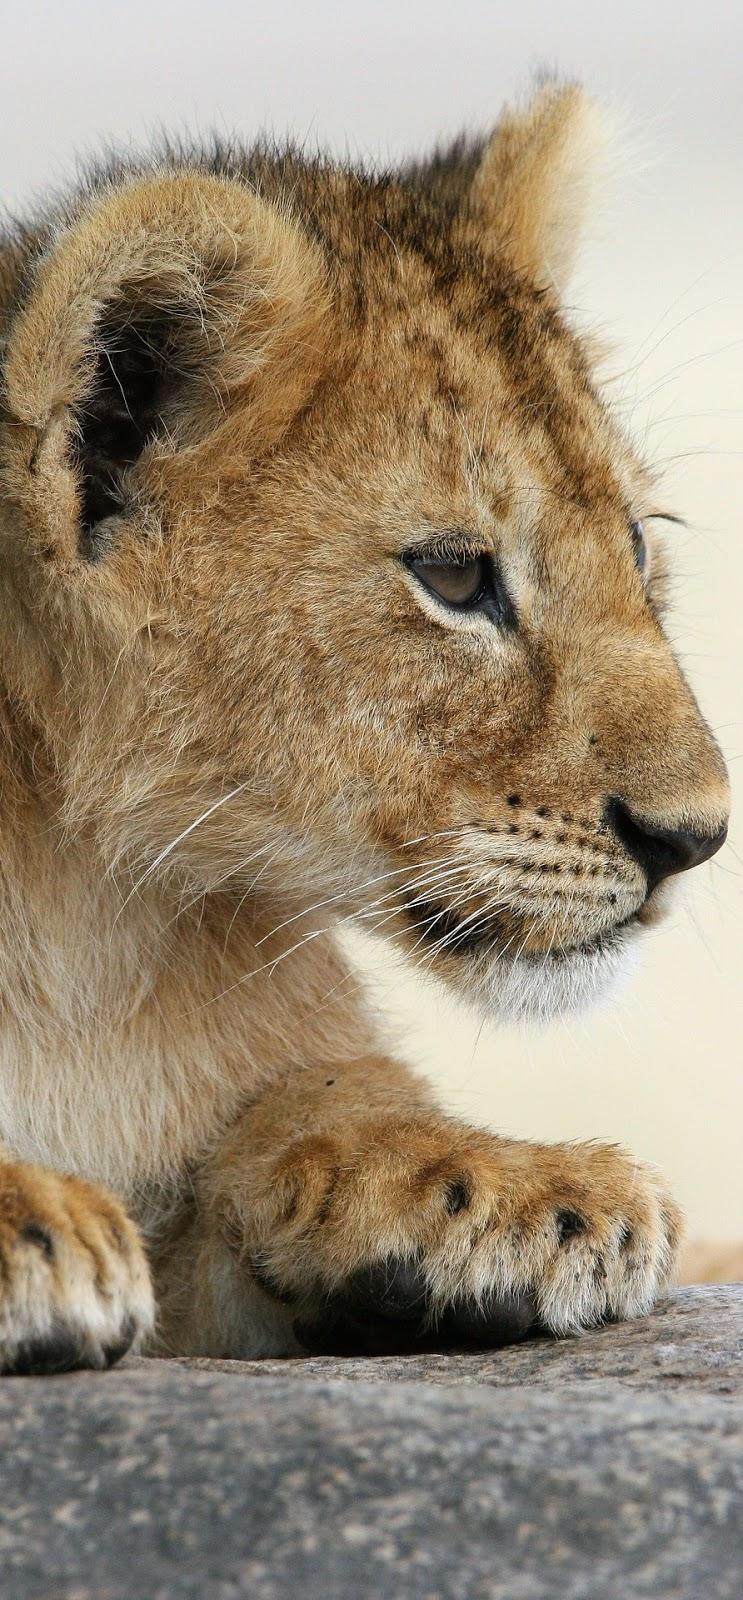 Cute lion cub.